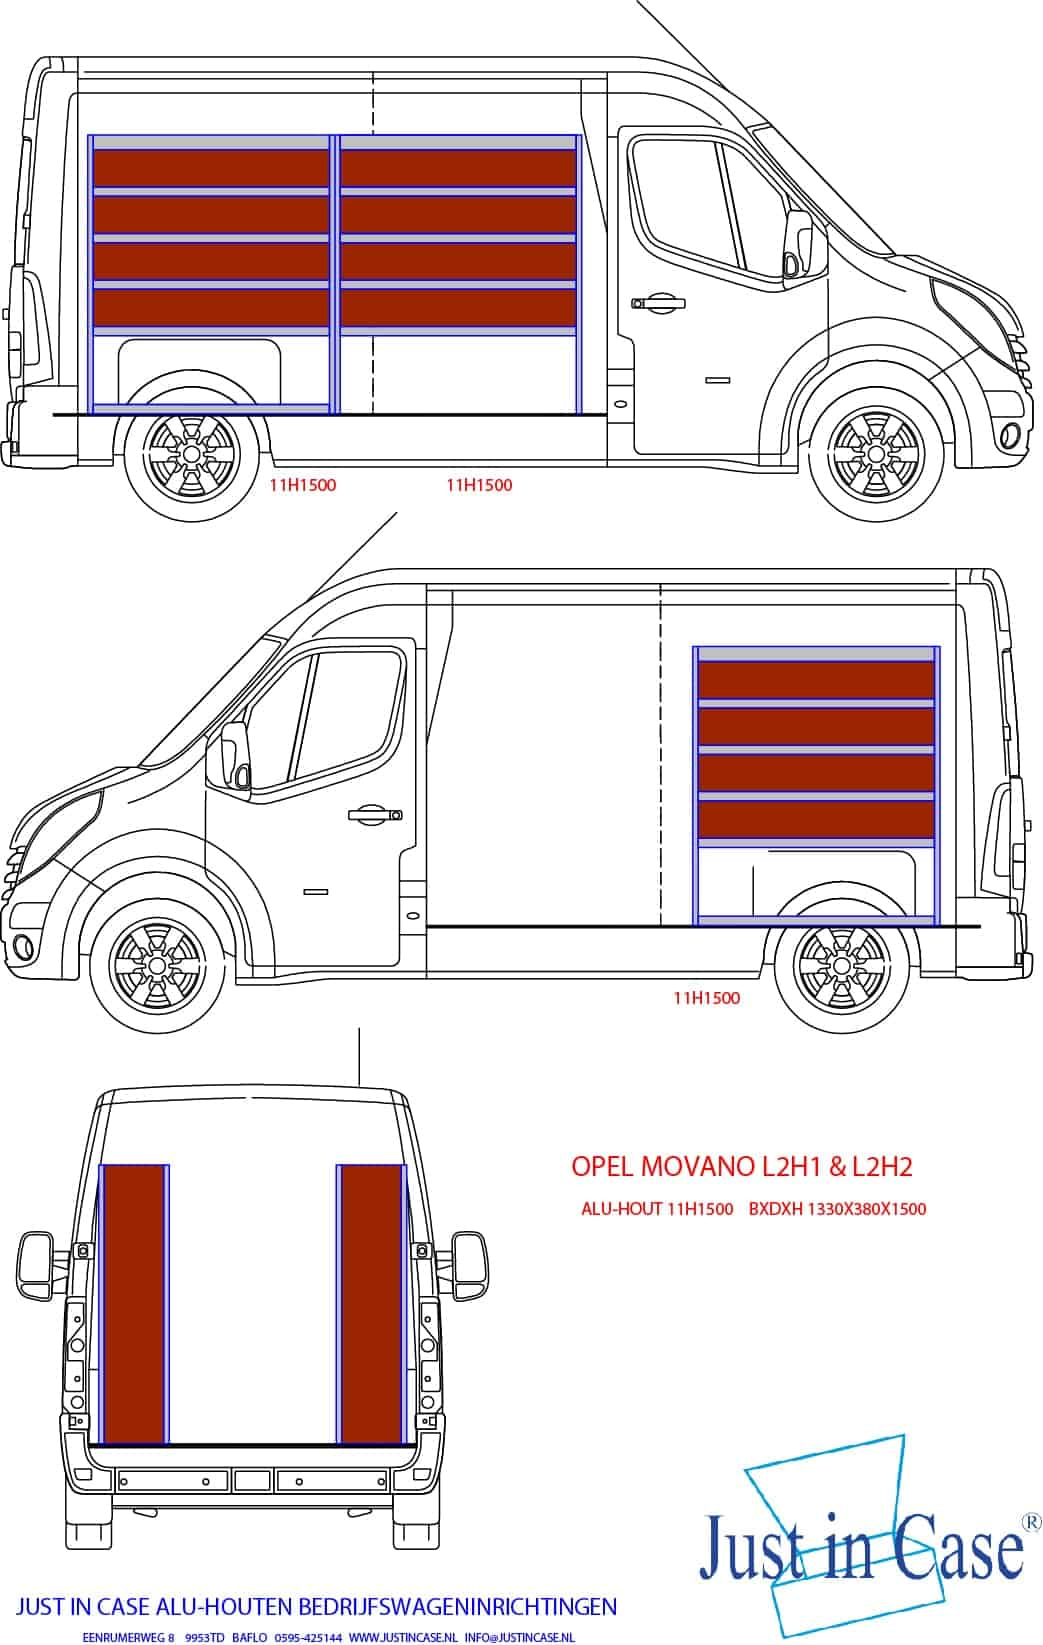 Opel Movano (L2) schets